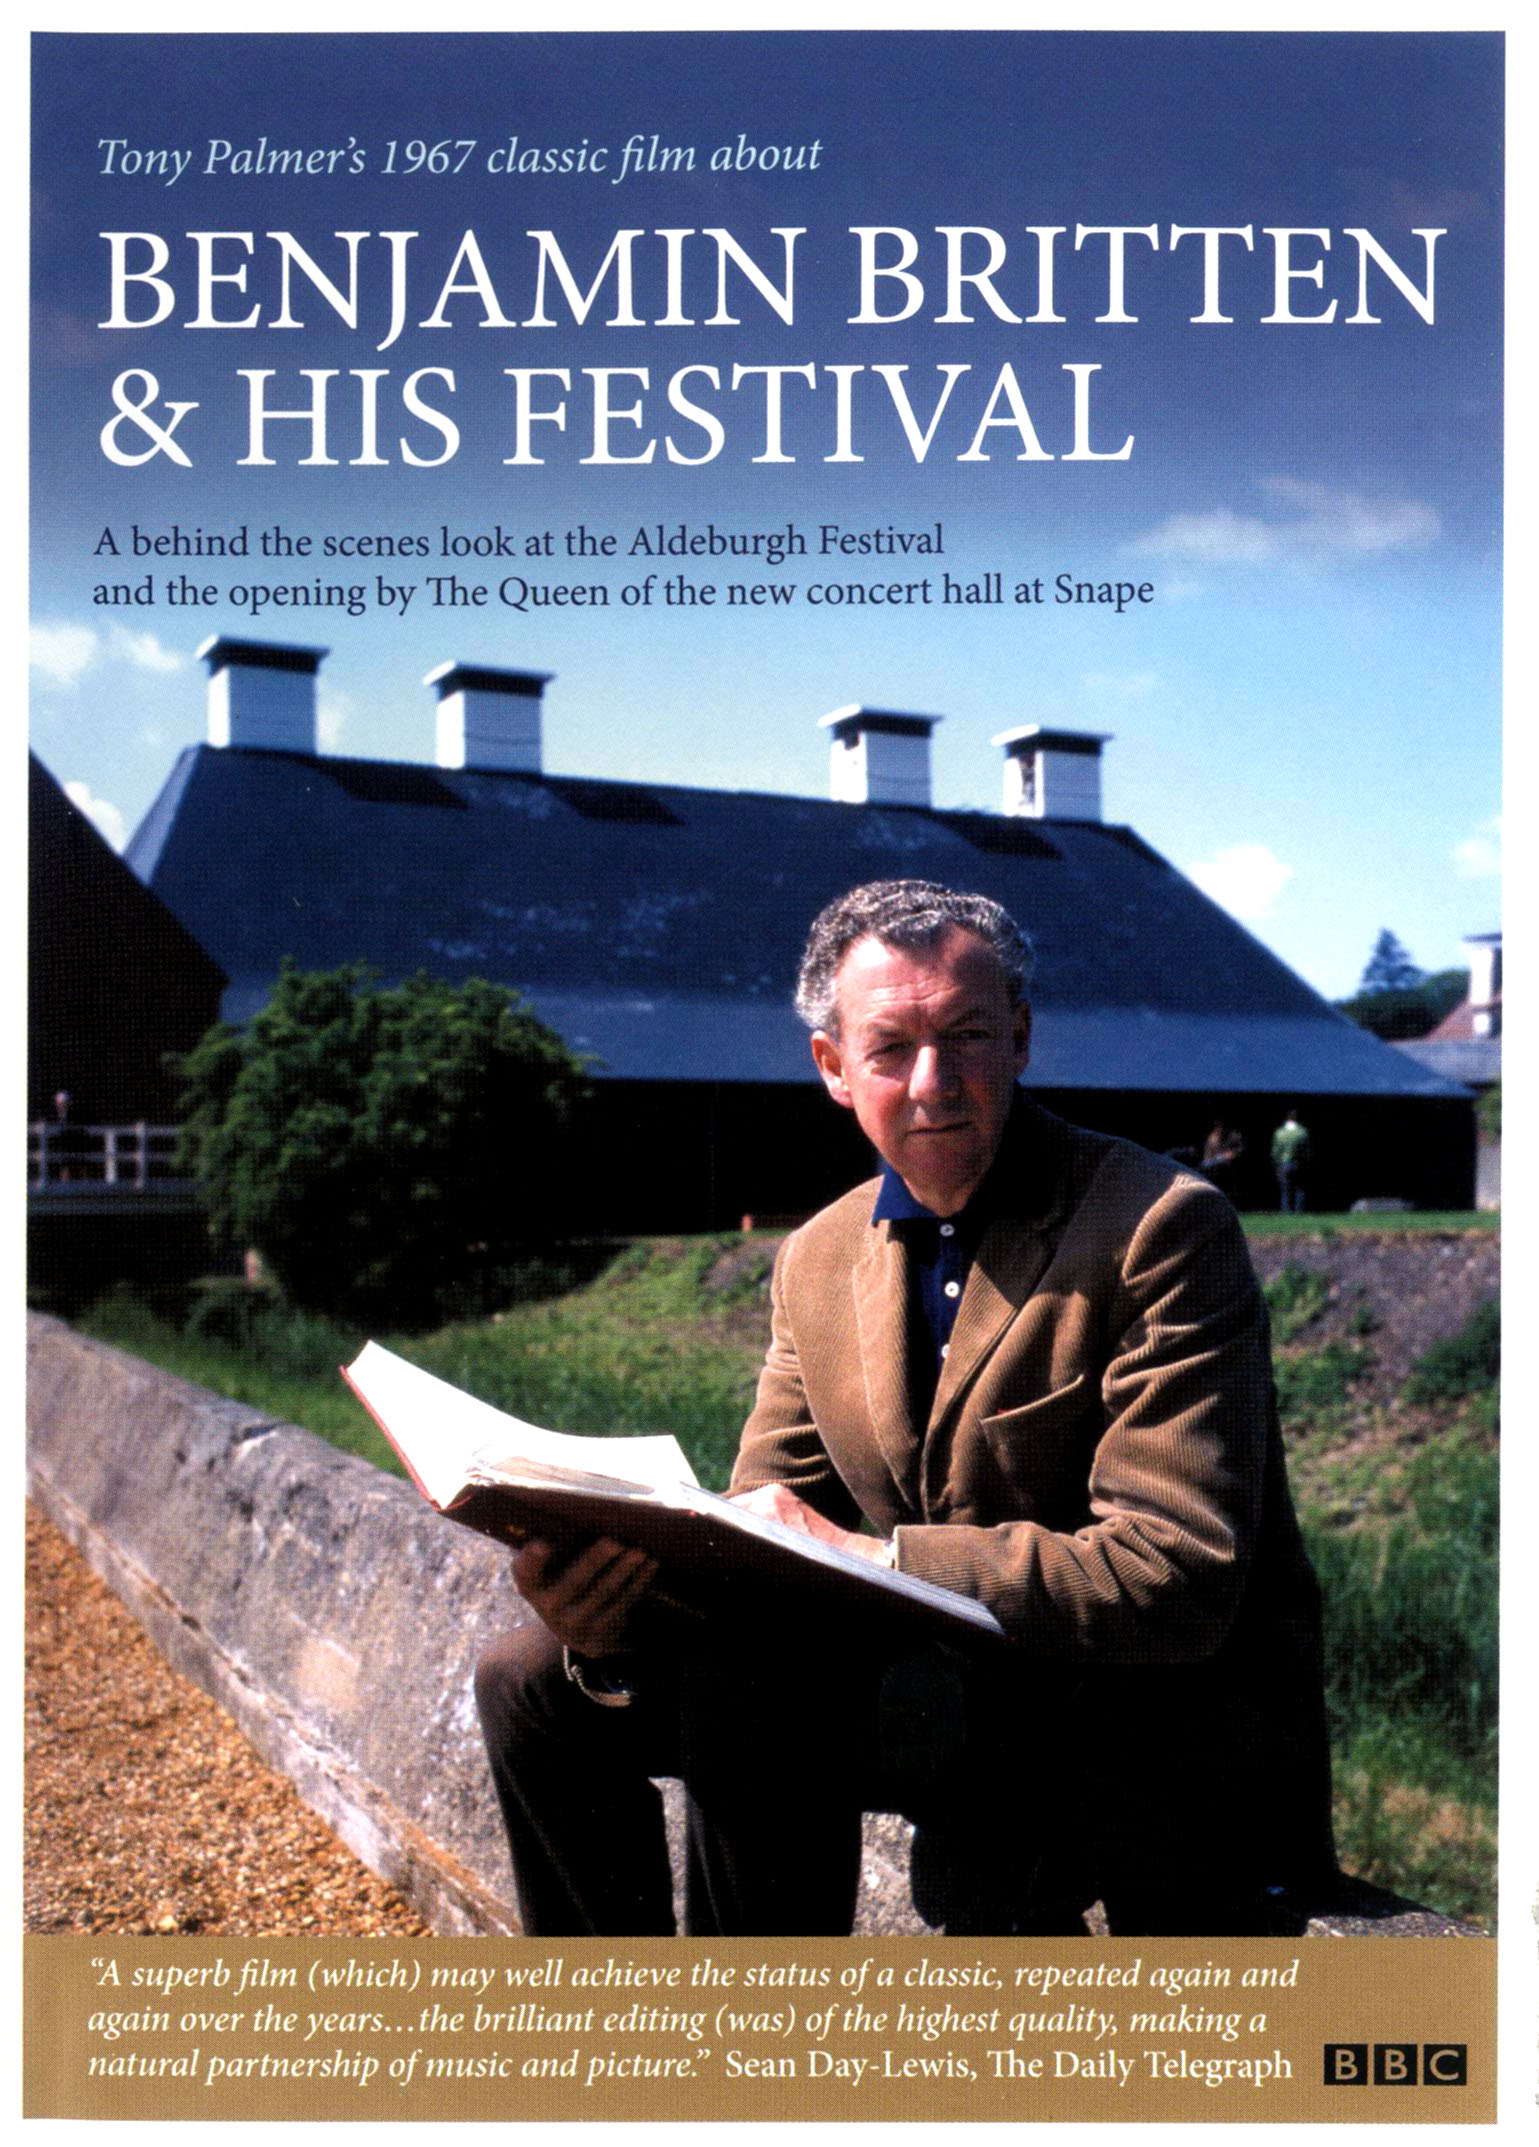 Benjamin Britten and His Festival